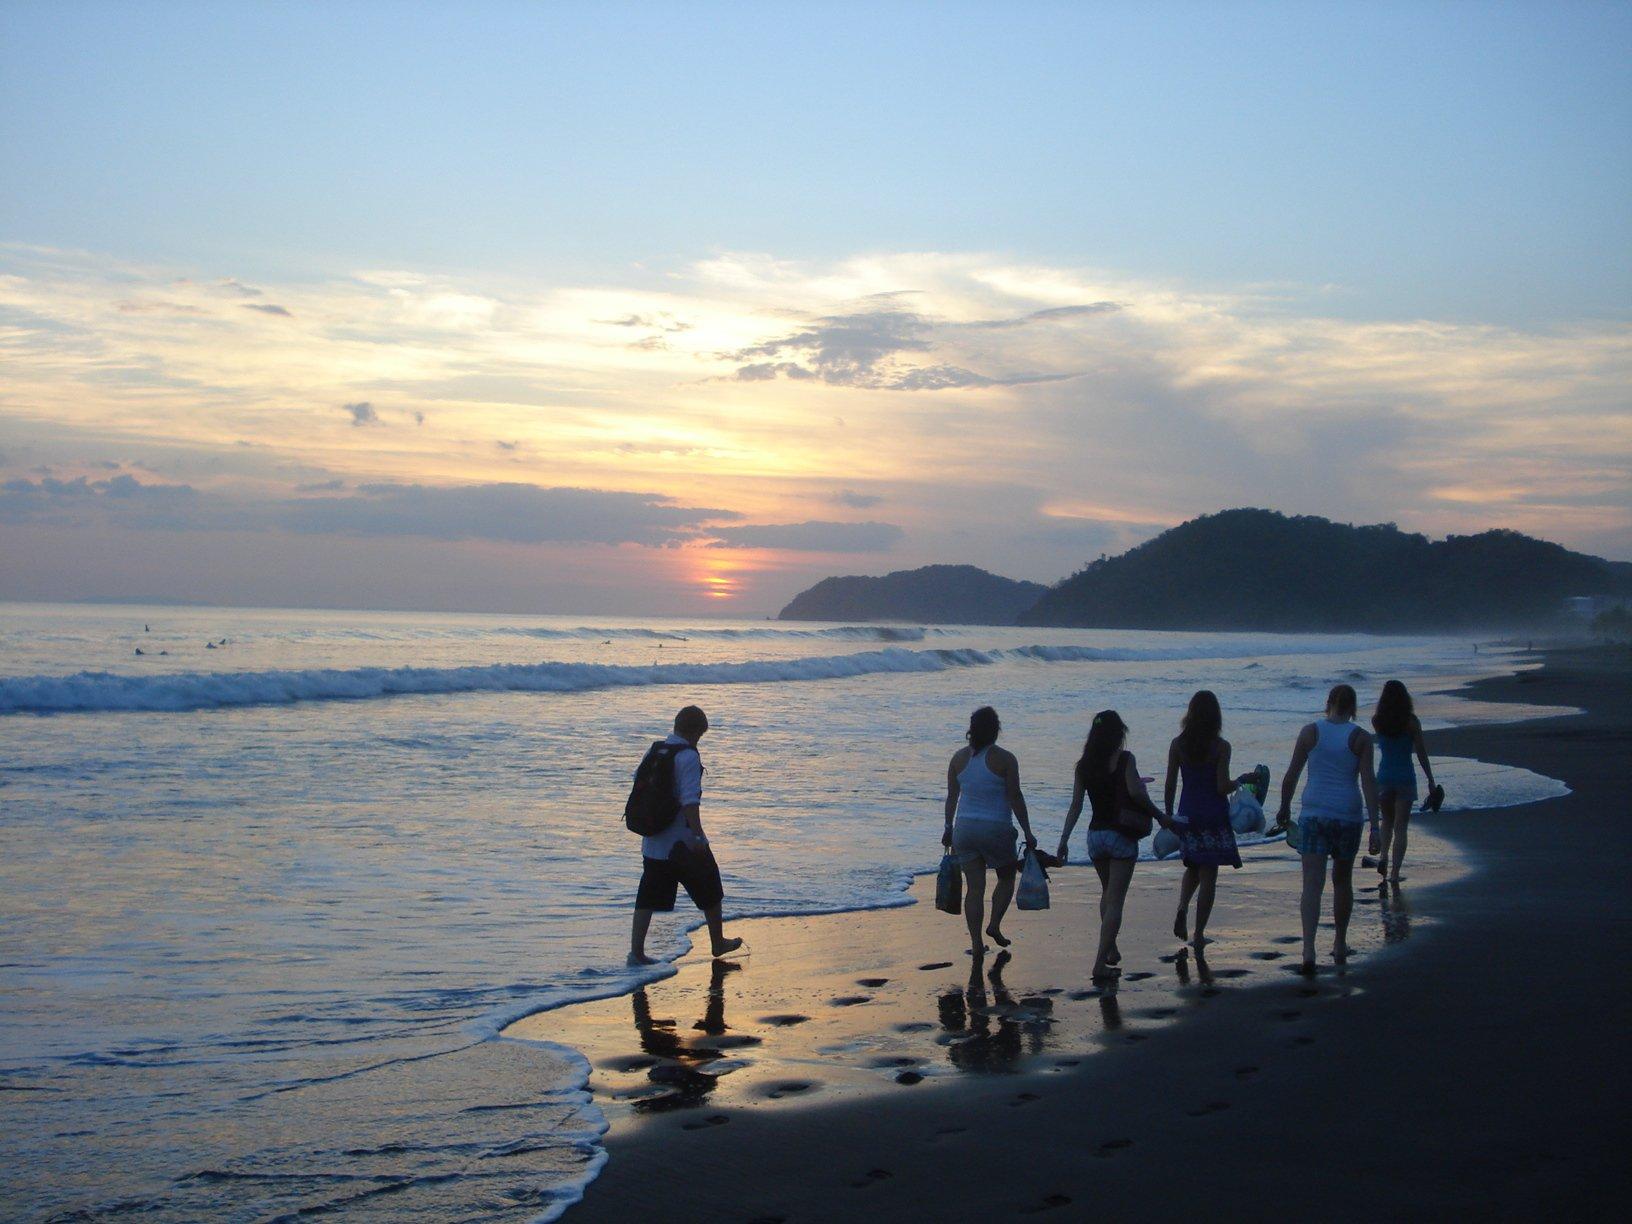 JSED_World_Costa Rica_Beach_Youth